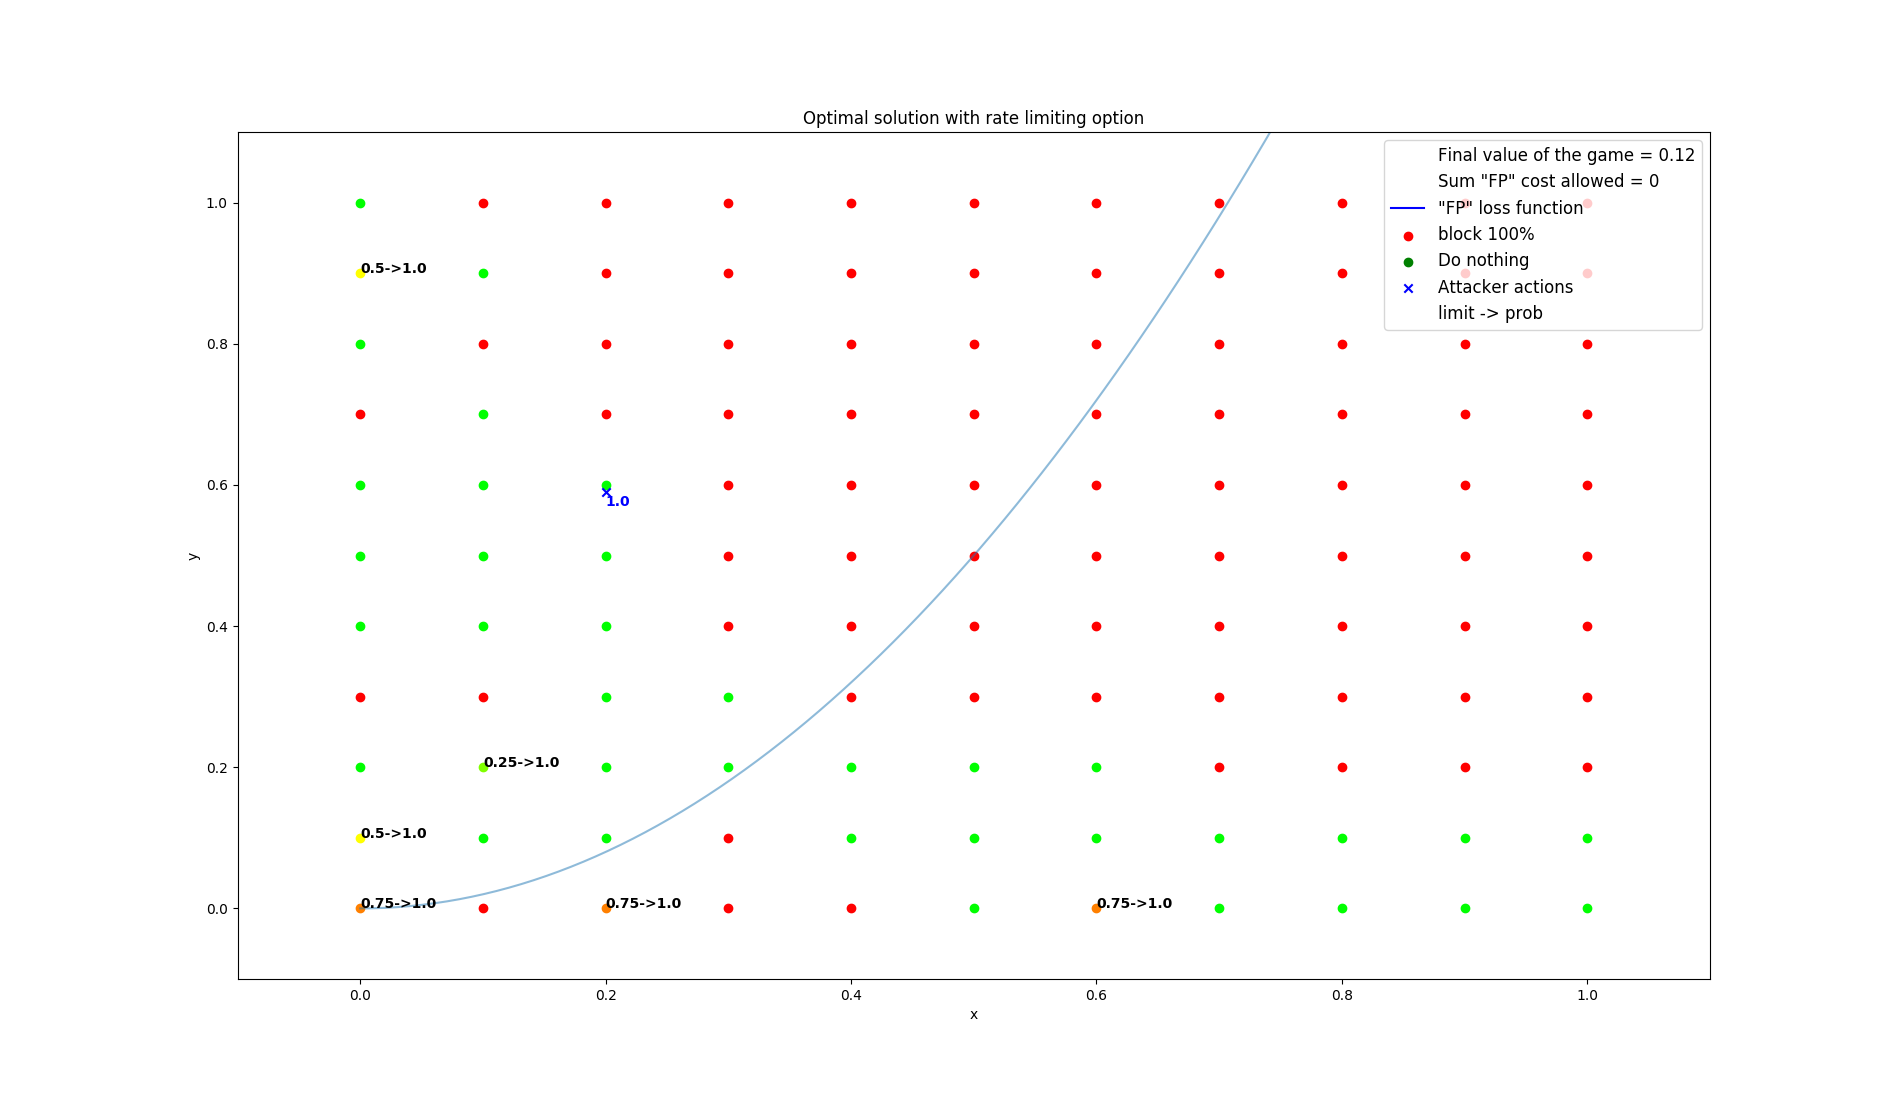 results/optimal/false_positive_constraint/2-summarization.png